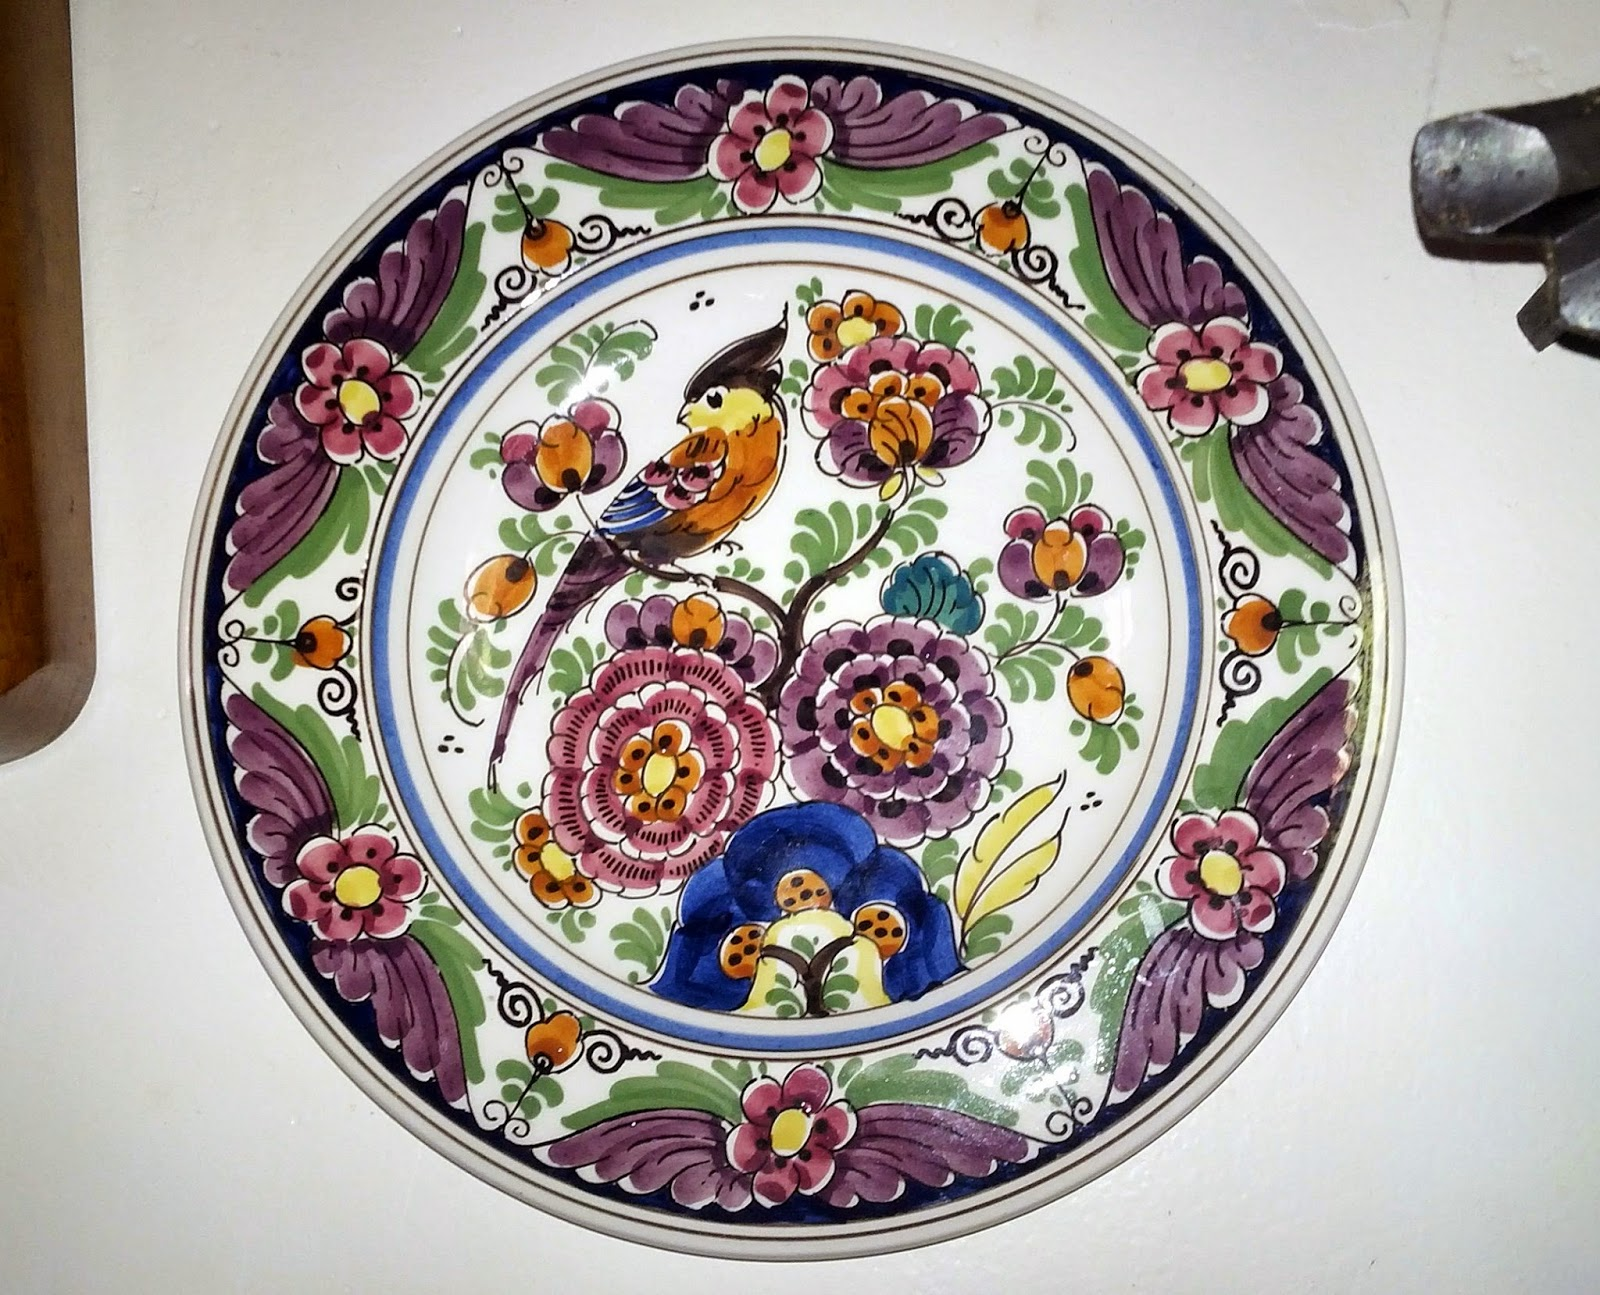 SALE - Velsen Delft Polychrome #1654